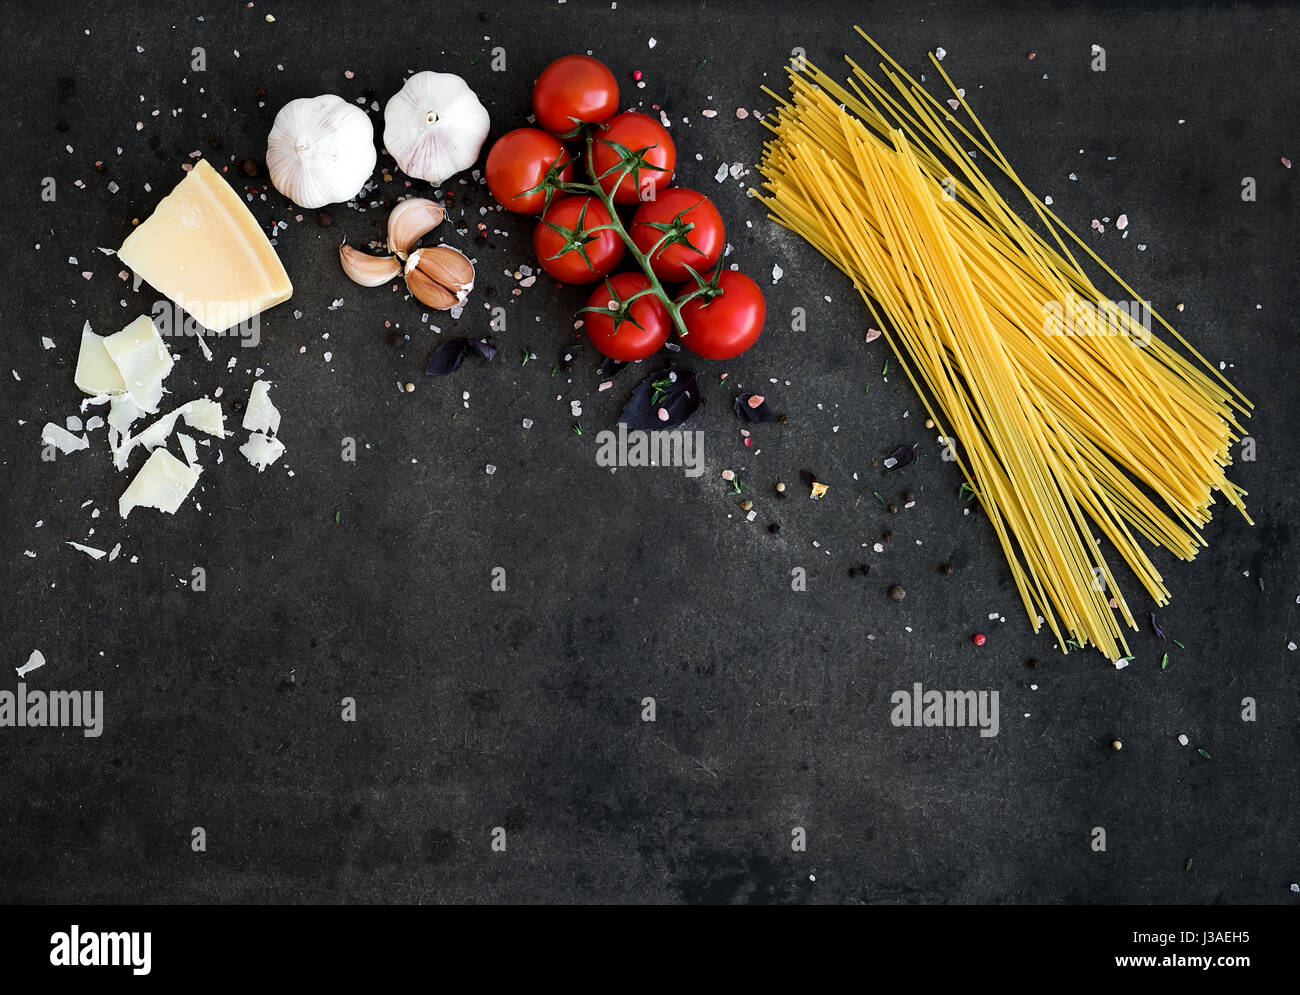 Food frame. Pasta ingredients. Cherry-tomatoes, spaghetti pasta, garlic, basil, parmesan and spices on dark grunge - Stock Image